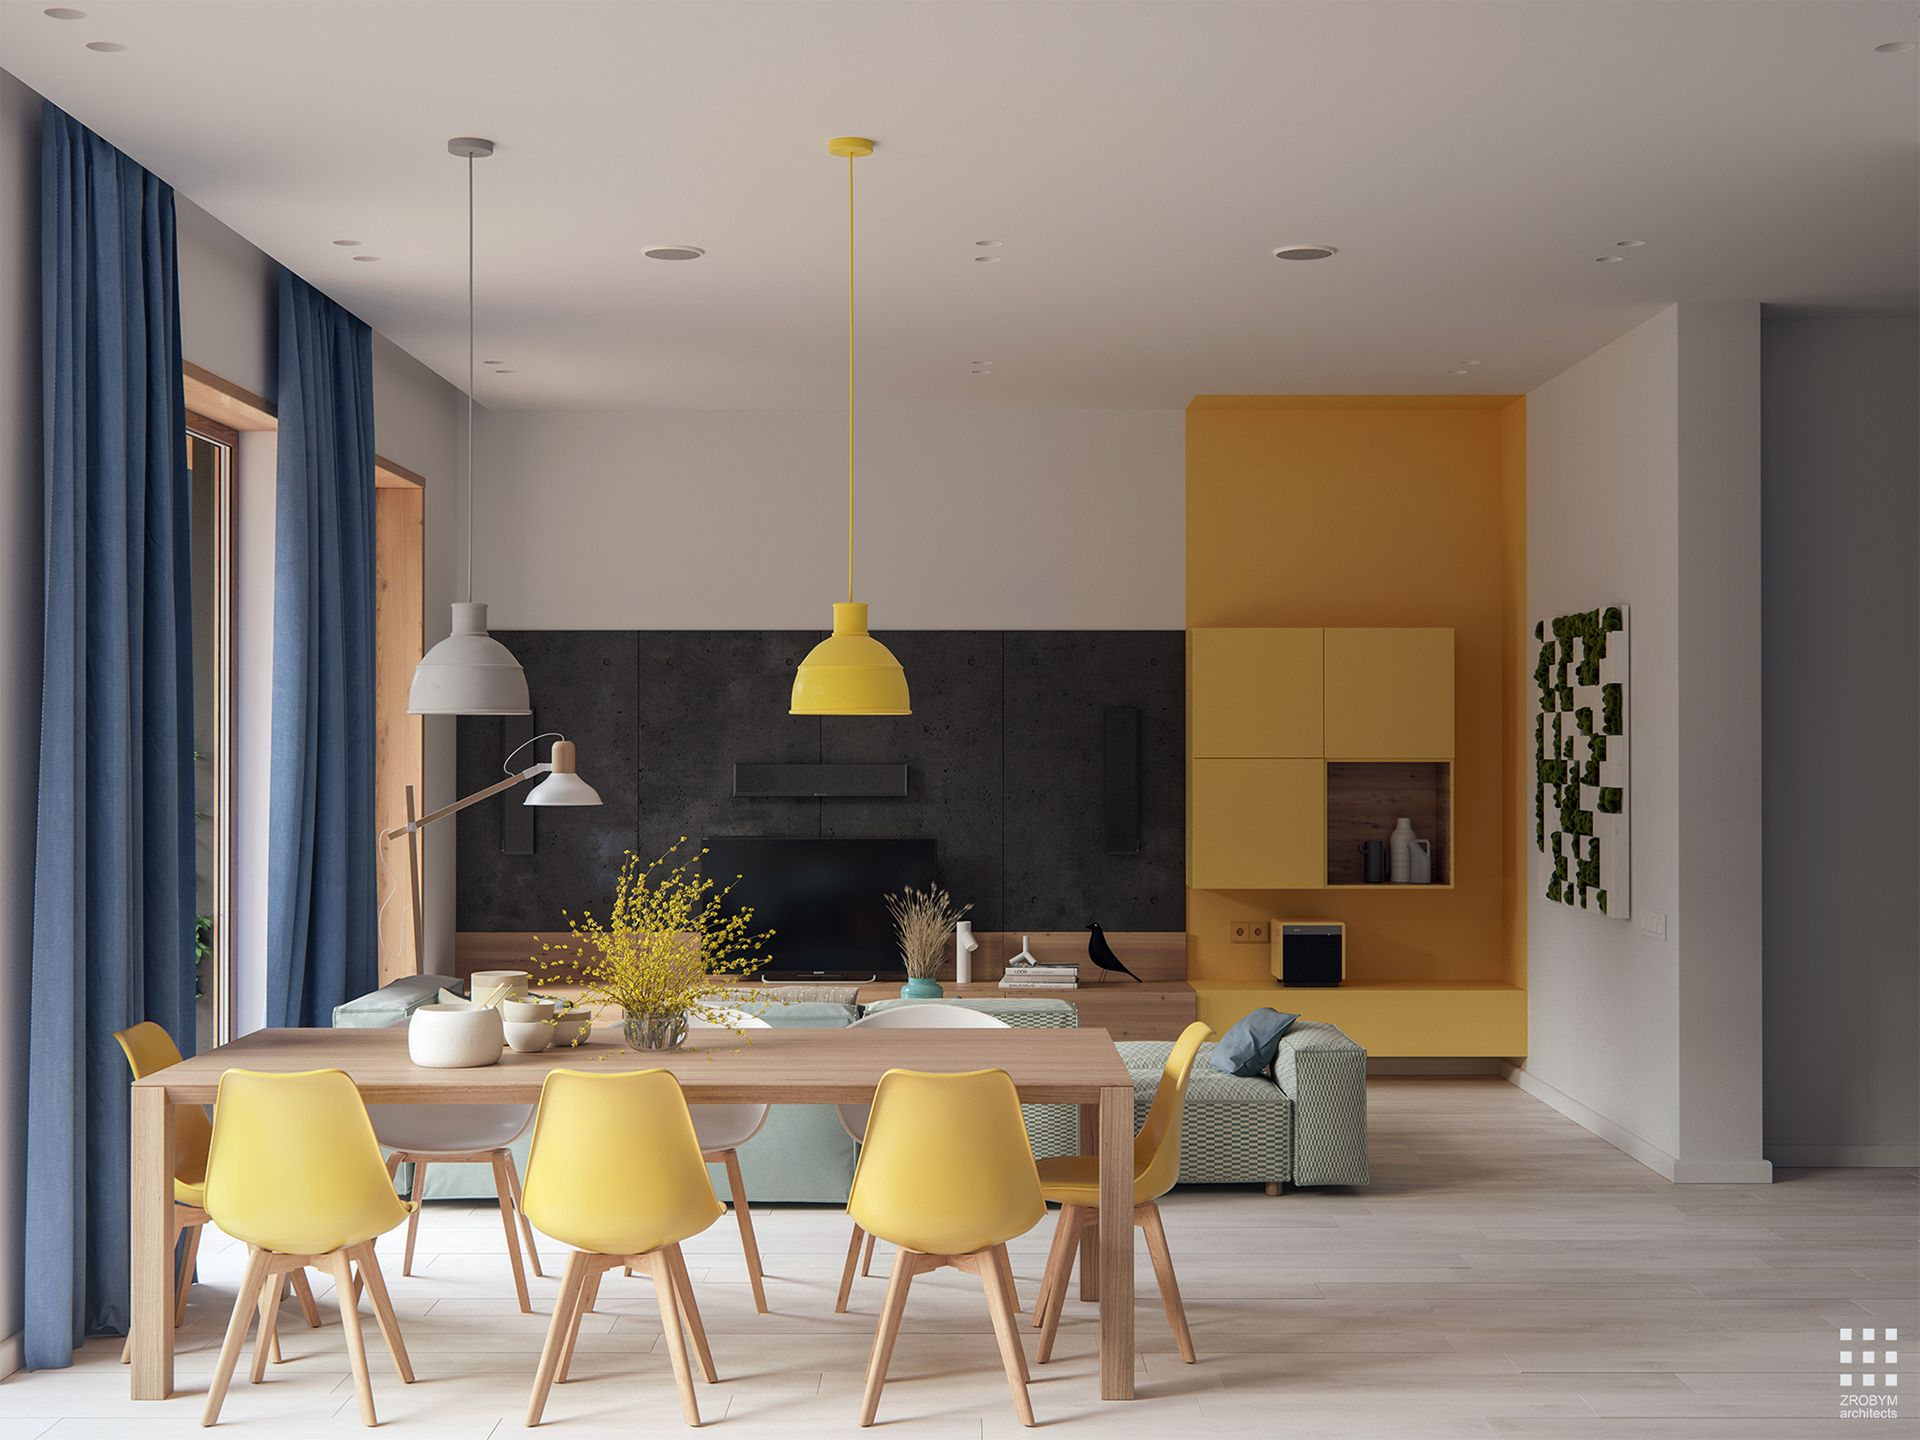 SOSNOVAYA interior on Behance | Minimalist dining room ...